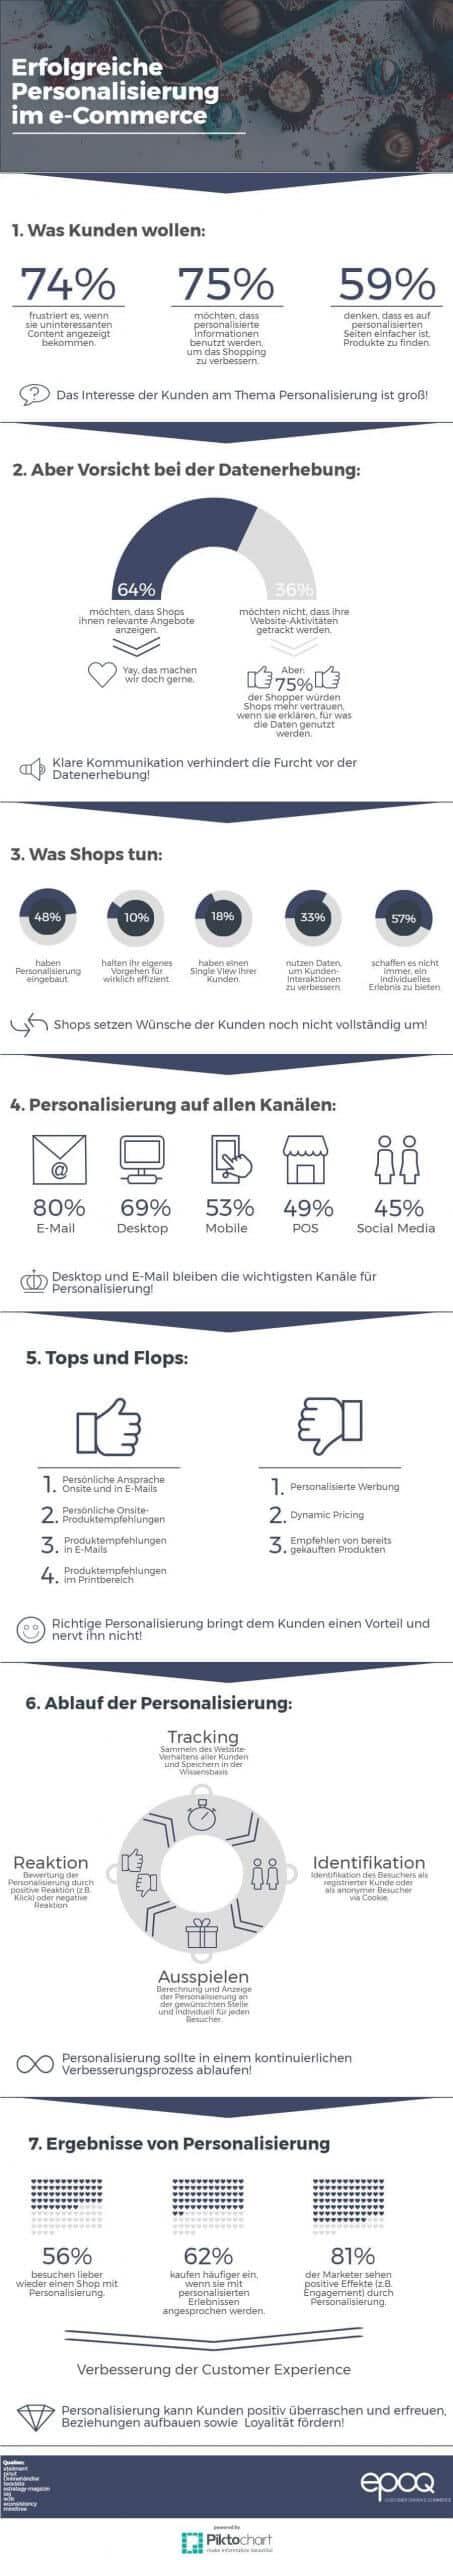 Infografik zur Personalisierung im E-Commerce